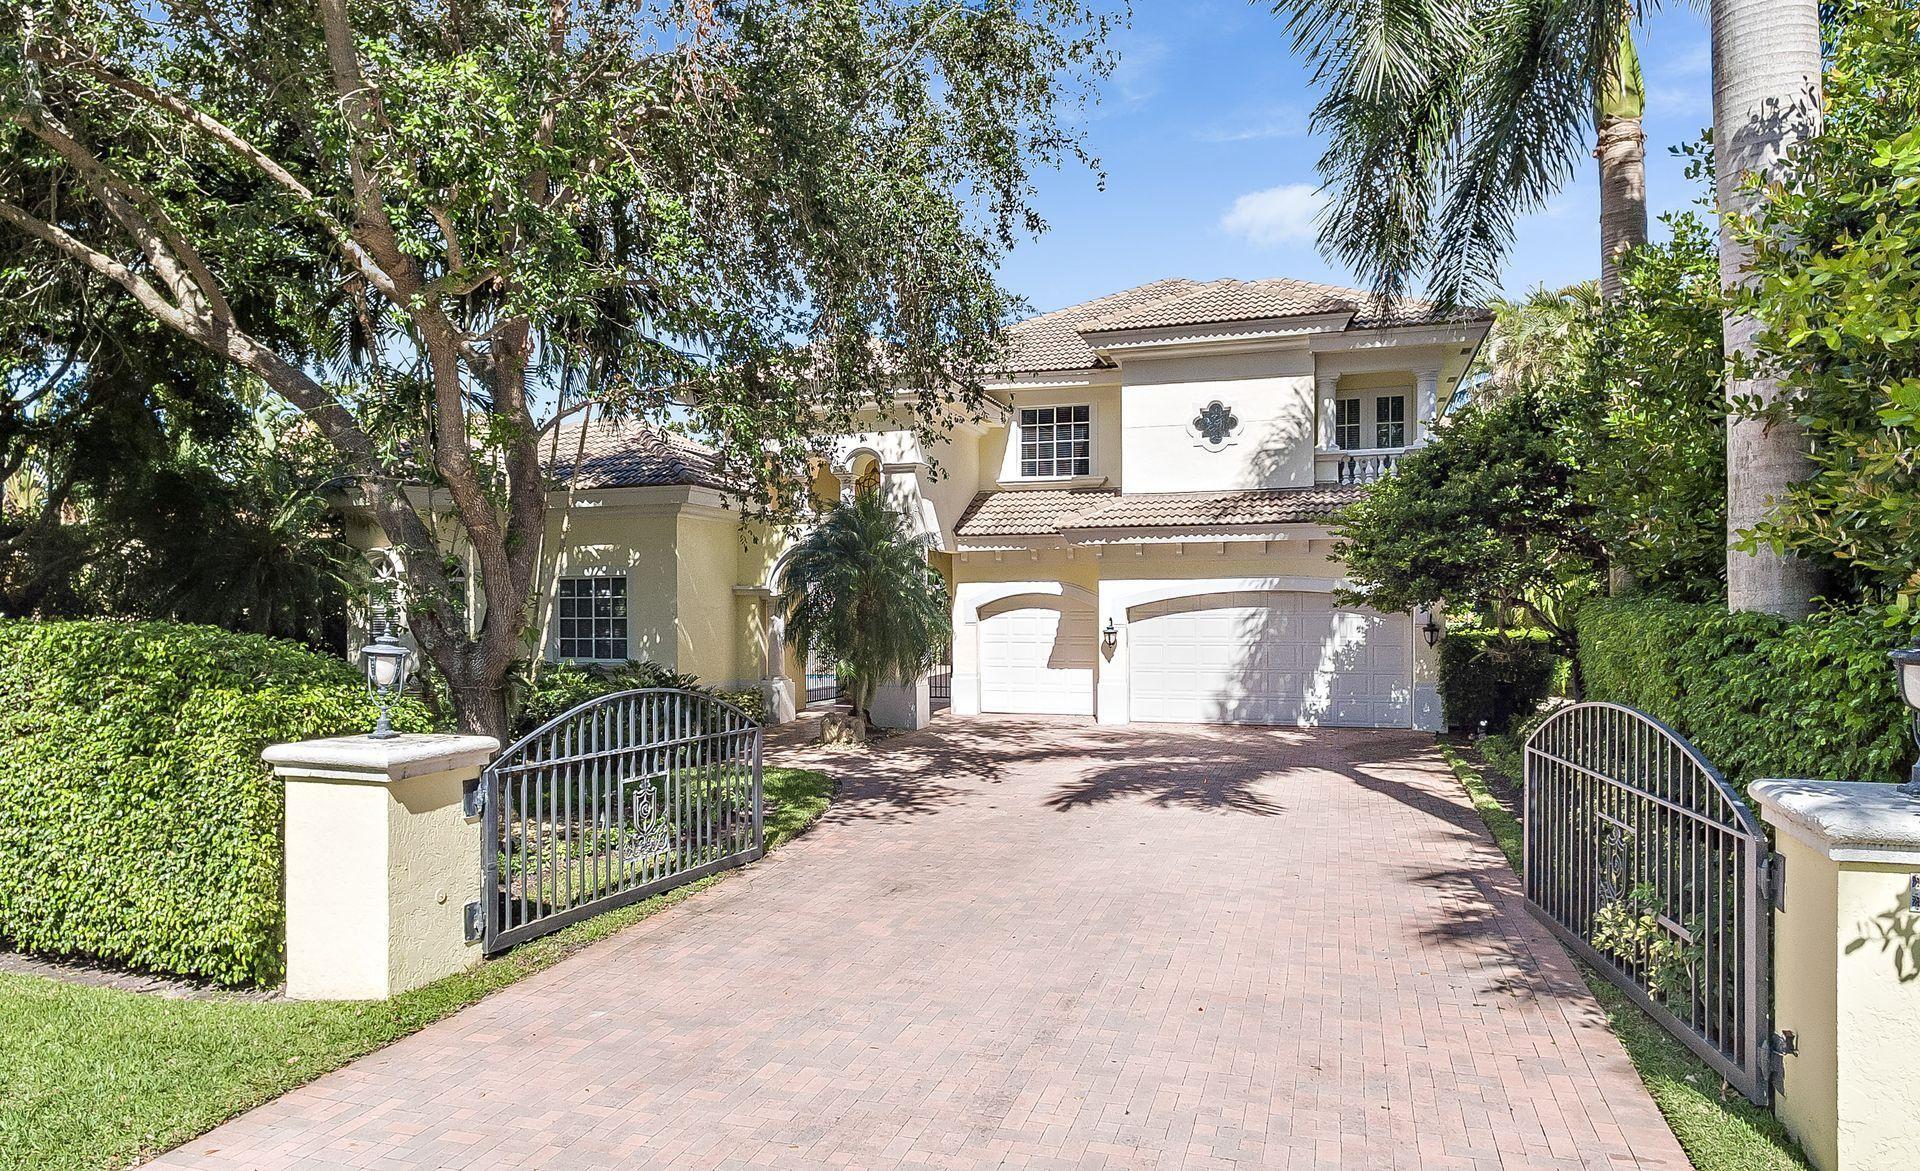 Photo of 7399 Orangewood Lane, Boca Raton, FL 33433 (MLS # RX-10582391)